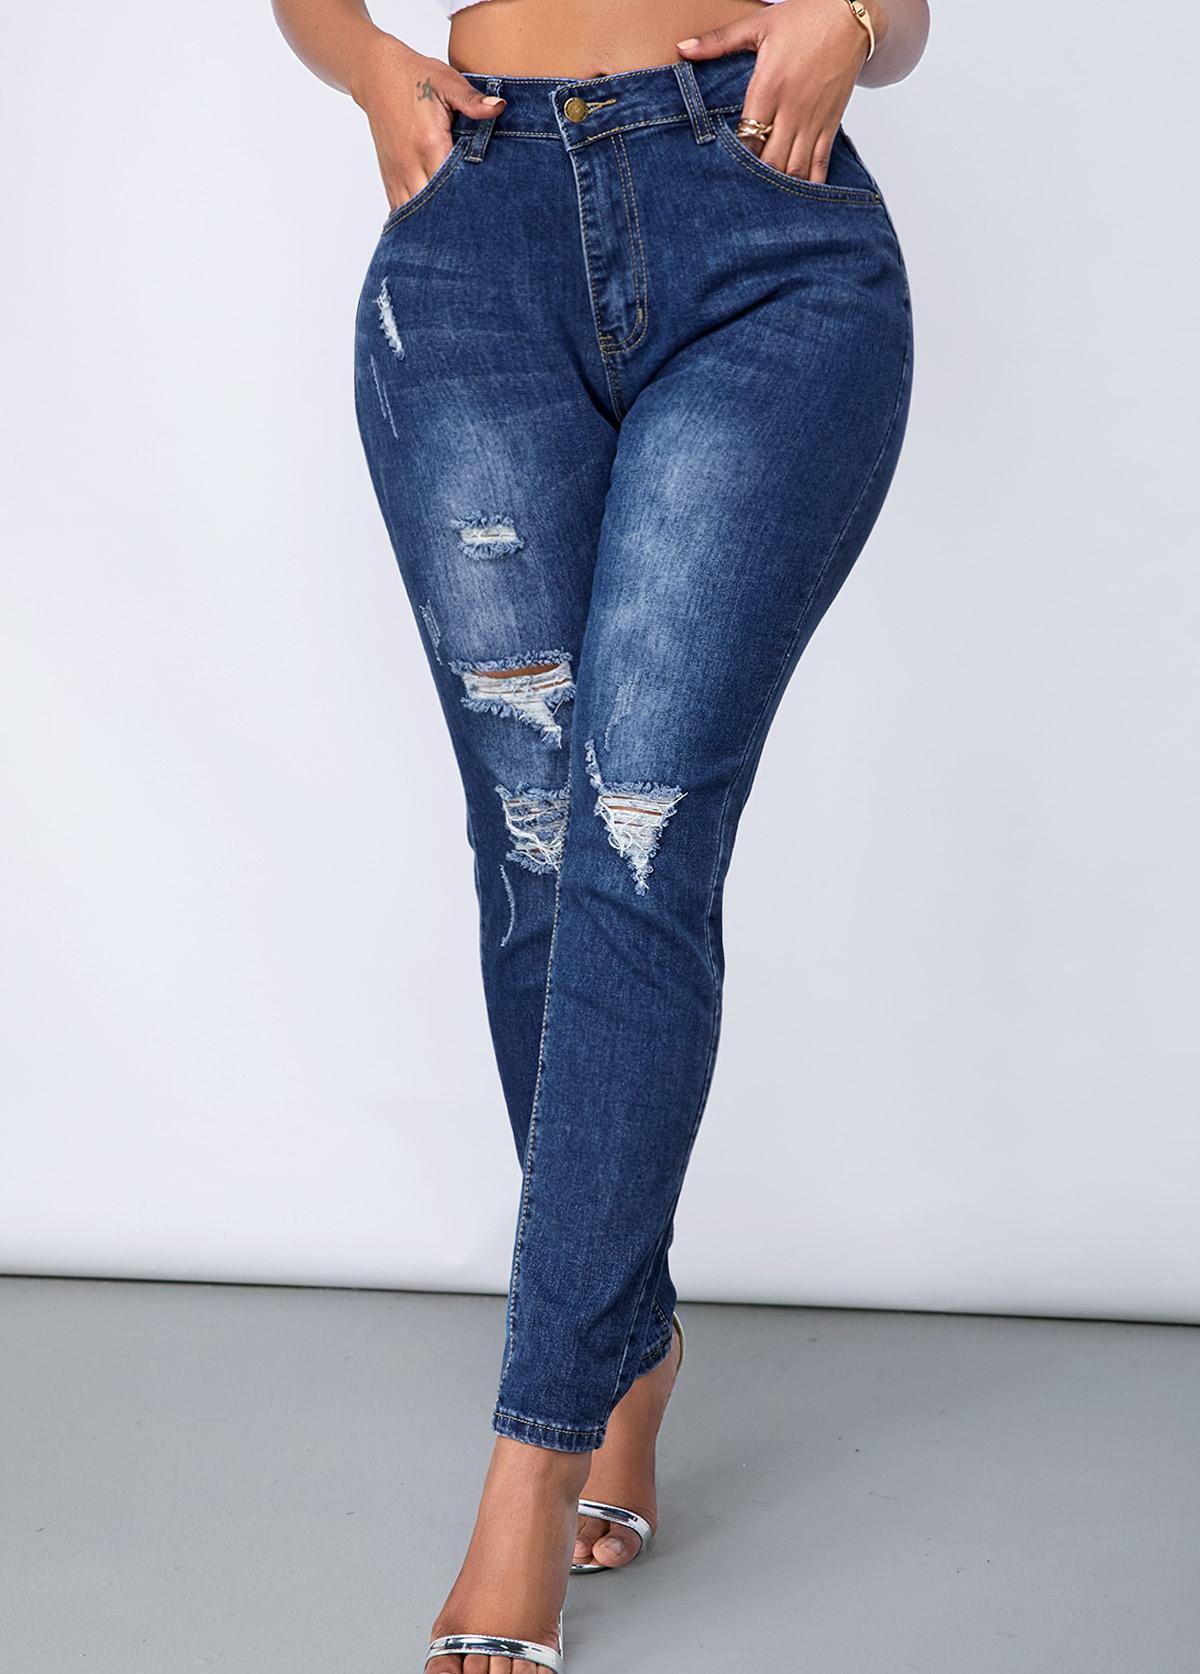 ROTITA Shredded Acid Washed Slant Pocket Skinny Jeans